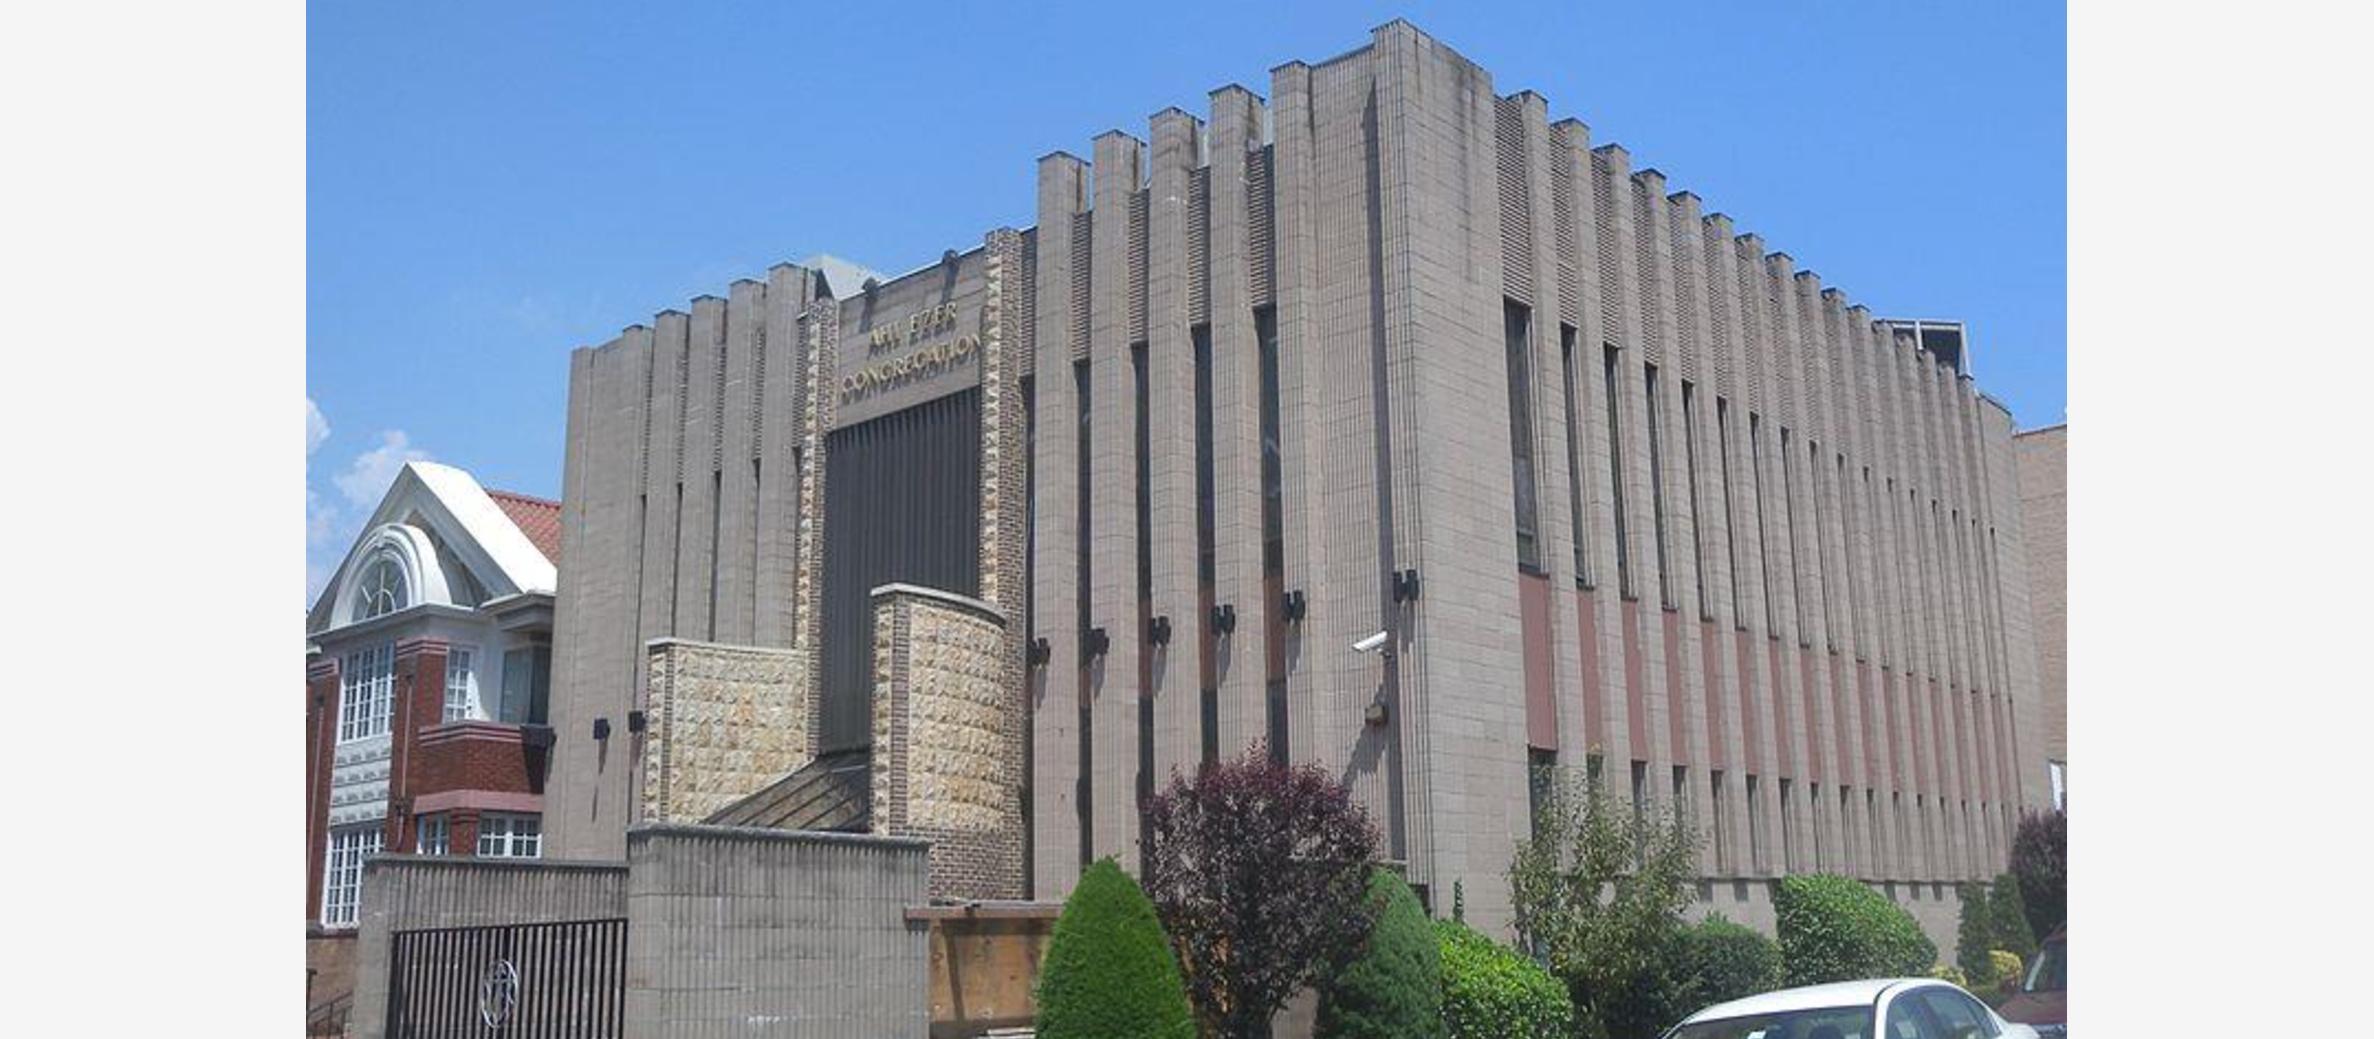 US: Man shouting anti-Semitic slurs tries to enter Brooklyn synagogue